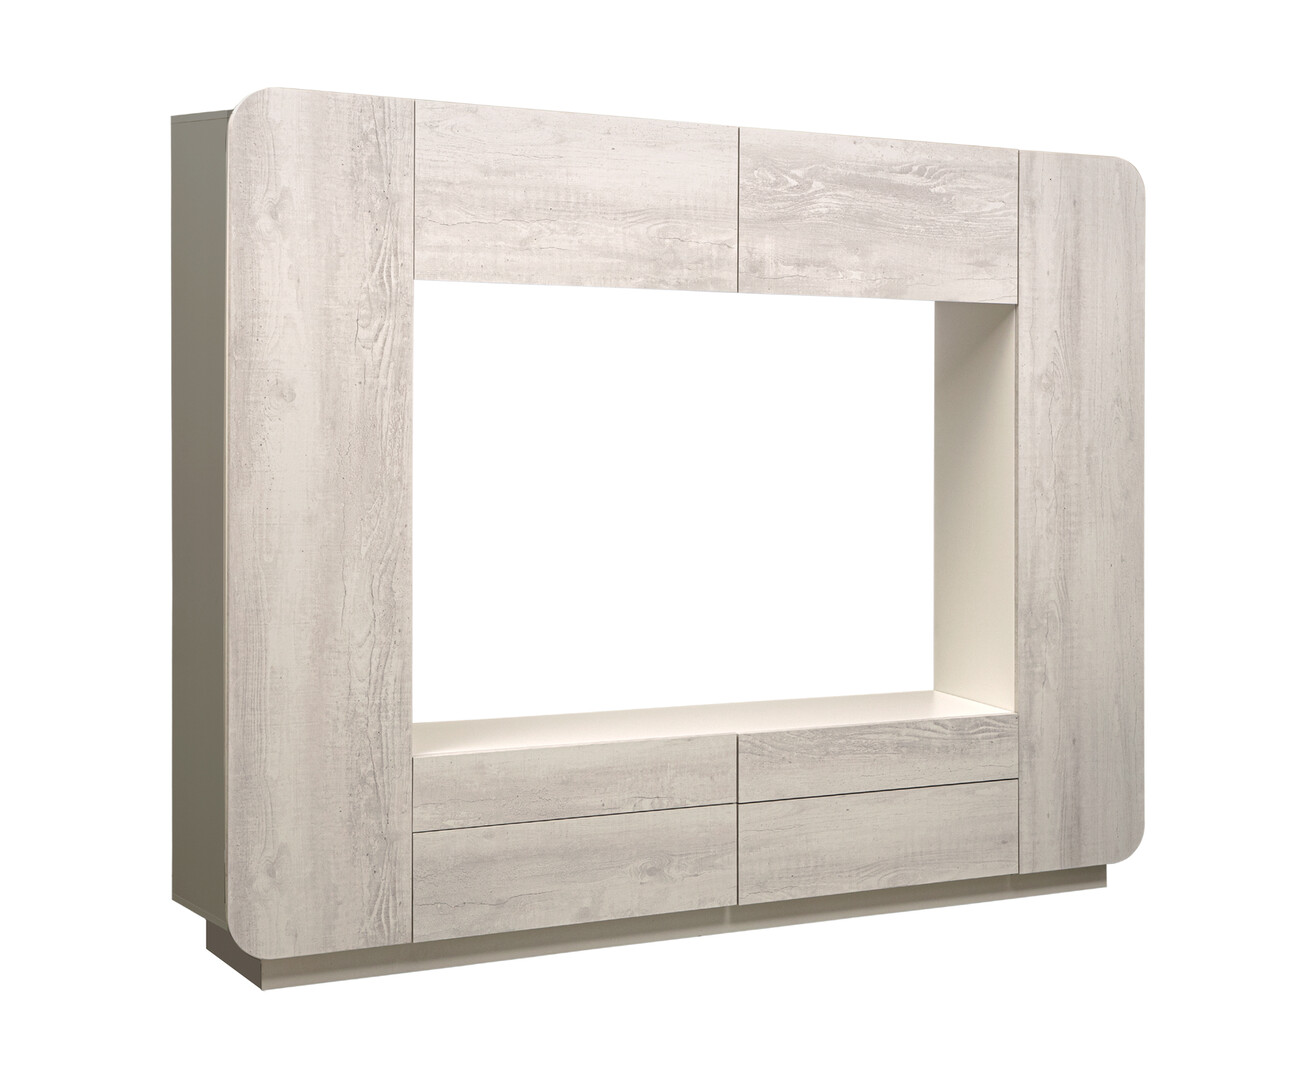 Стенка Лаванда 2 (бетон пайн белый)